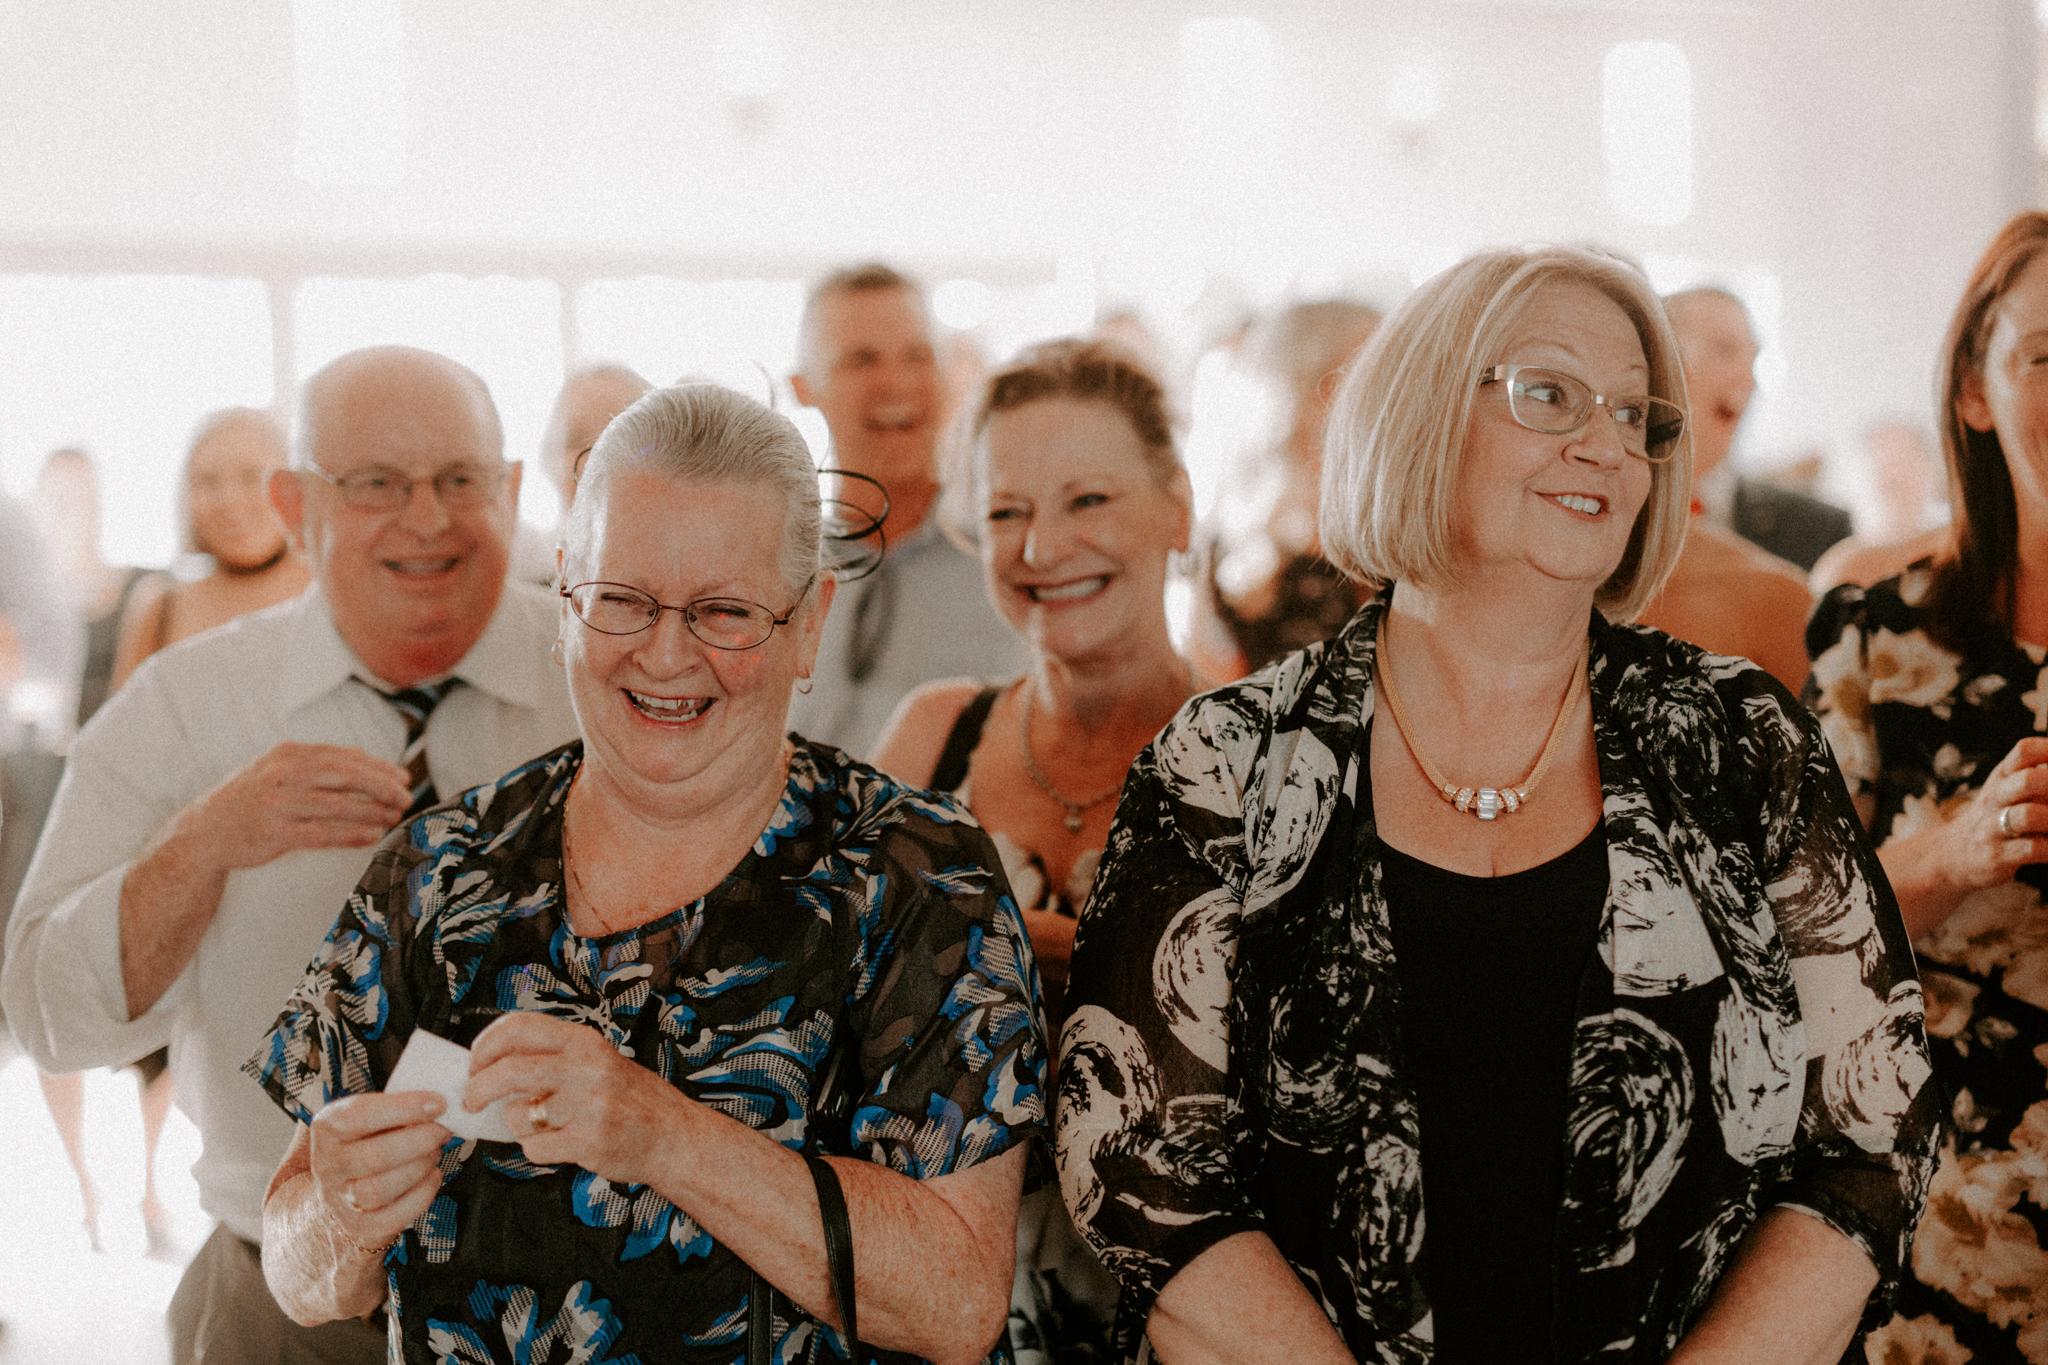 St-Kilda-Garden-Wedding-Emotions-and-Math-Photograph-193.jpg